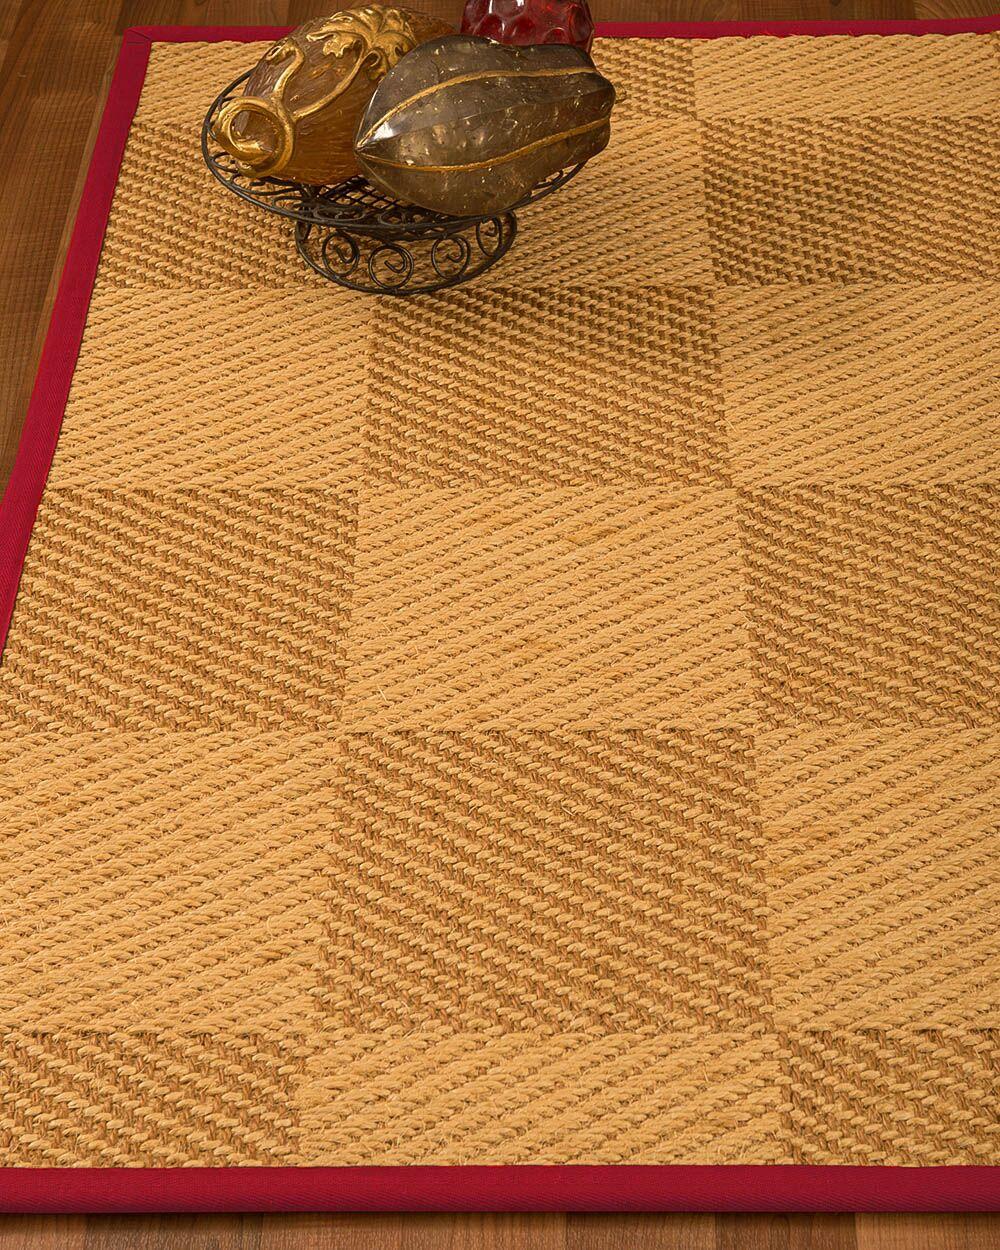 Luhrmann Hand Woven Jute/Sisal Beige/Brown Area Rug Rug Size: Rectangle 6' X 9'